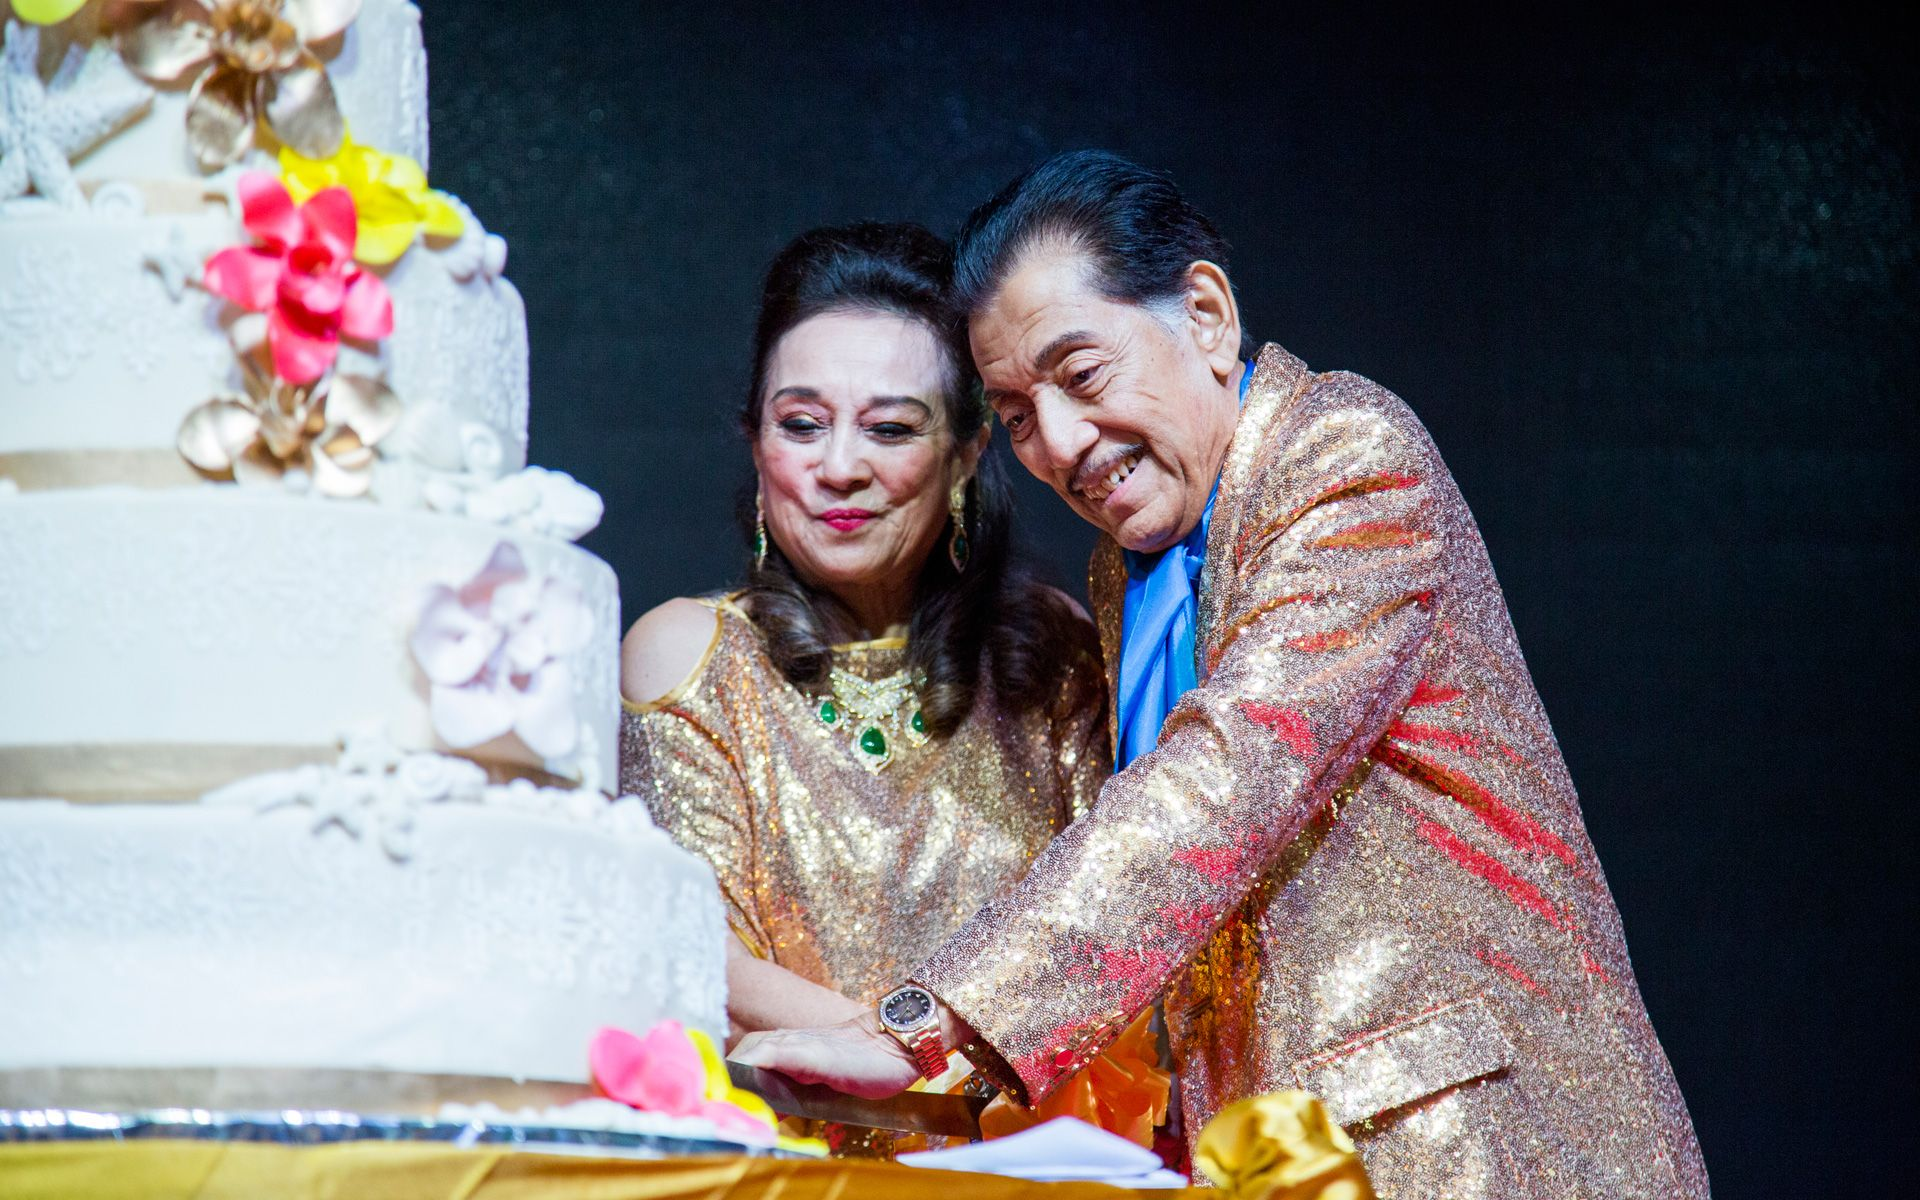 Tunku Dara Naquiah and Tunku Datuk Mudzaffar